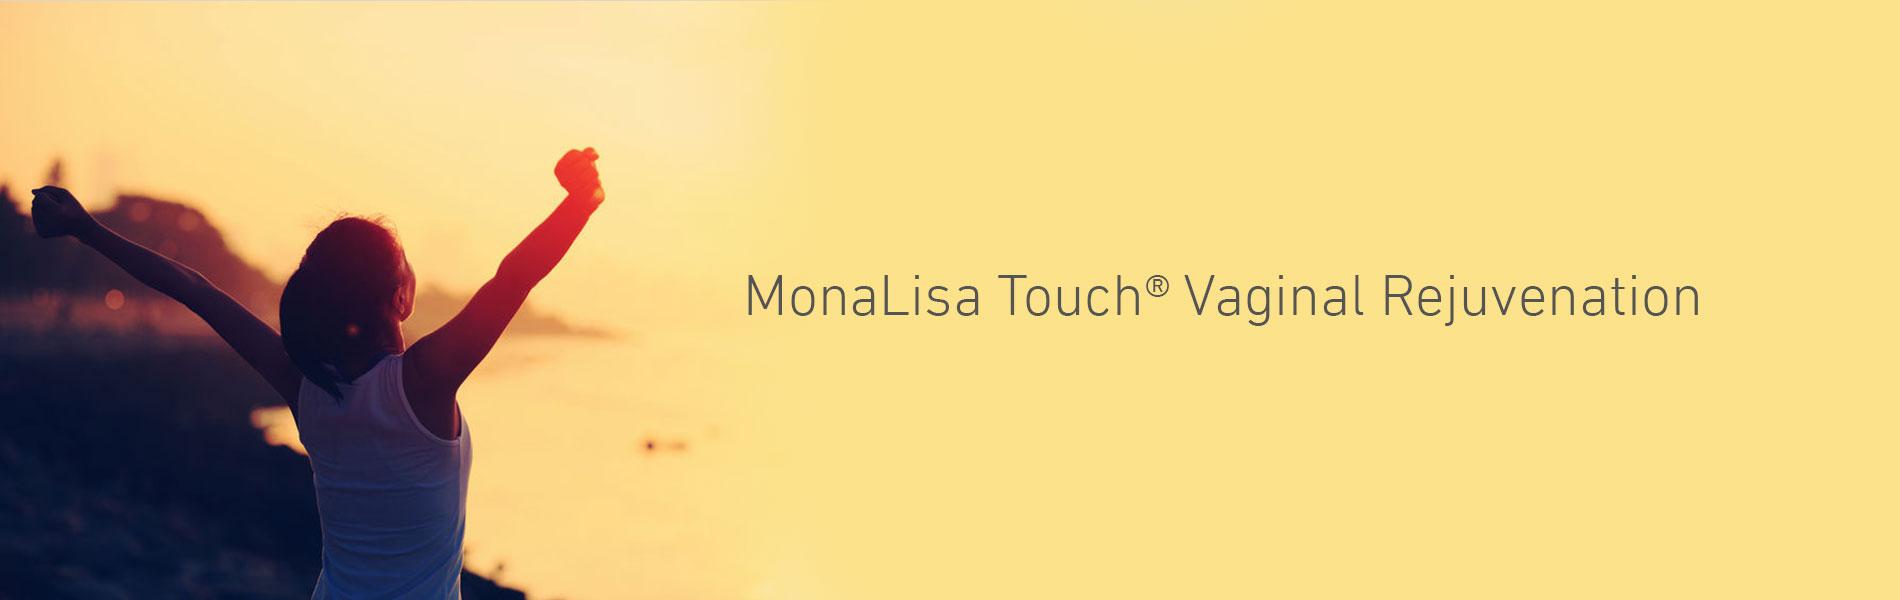 MonaLisa Touch® Vaginal Rejuvenation Southampton Hampshire Aesthetics Clinic